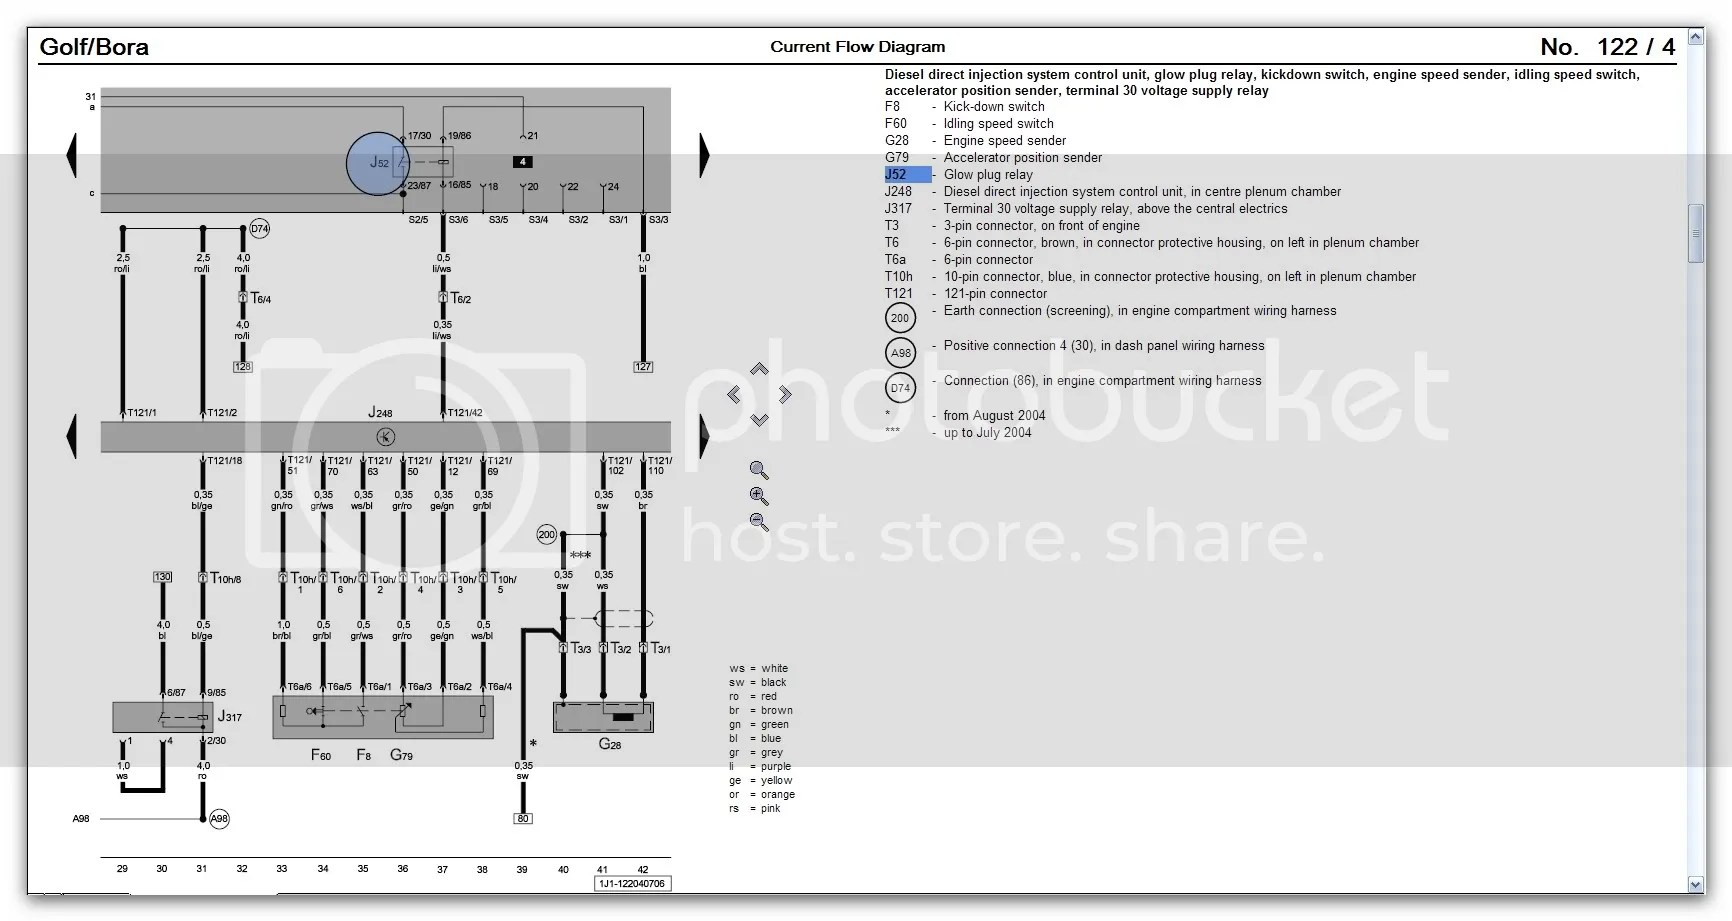 vw golf mk5 abs wiring diagram headlight switch mk4 glow plug trigger circuit tdi pd 150 engine